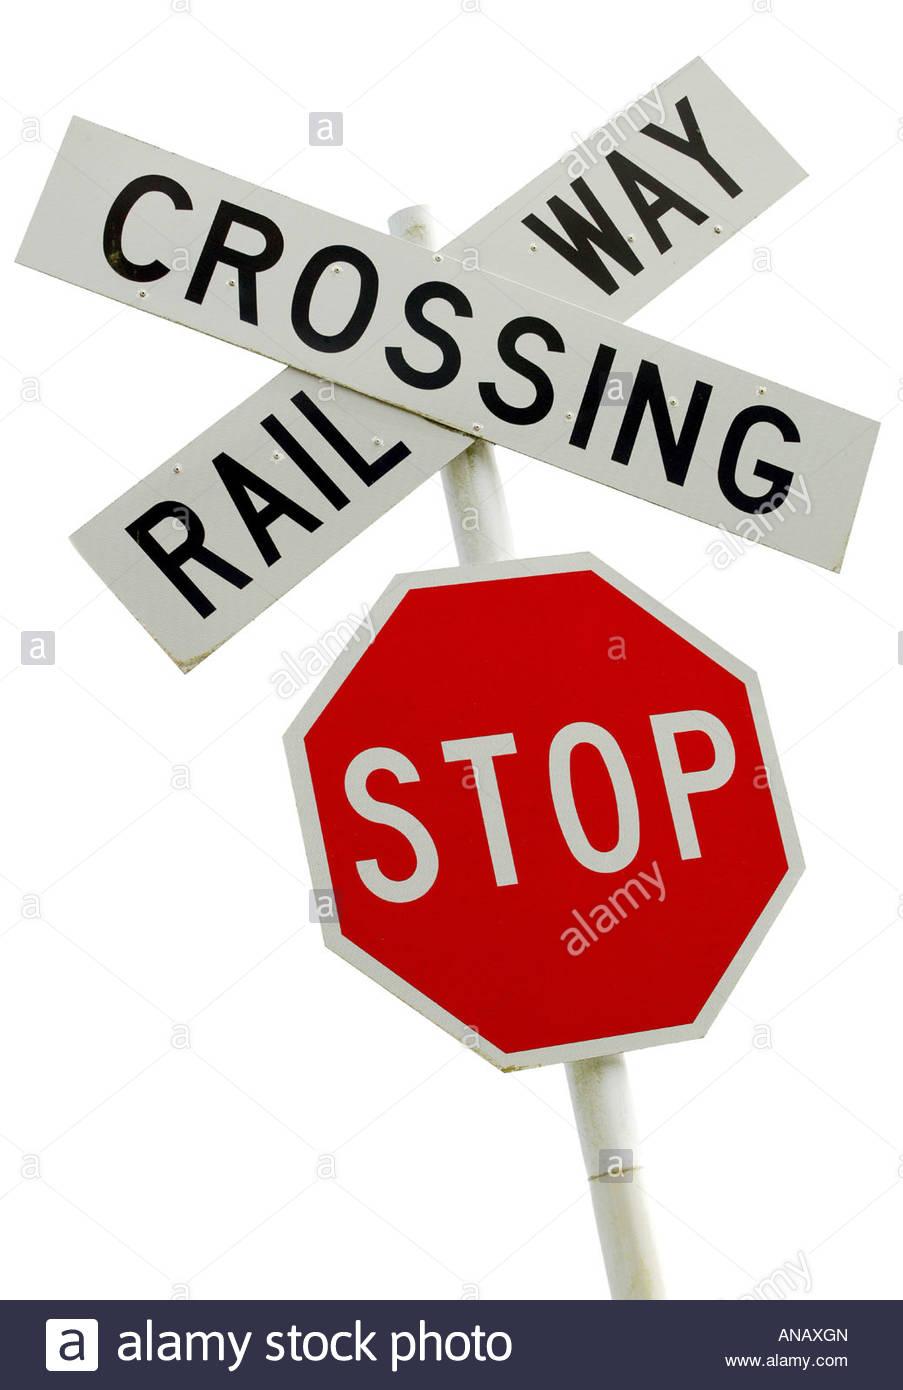 Stop! Give Way! Railway Crossing!, New Zealand Stock Photo.